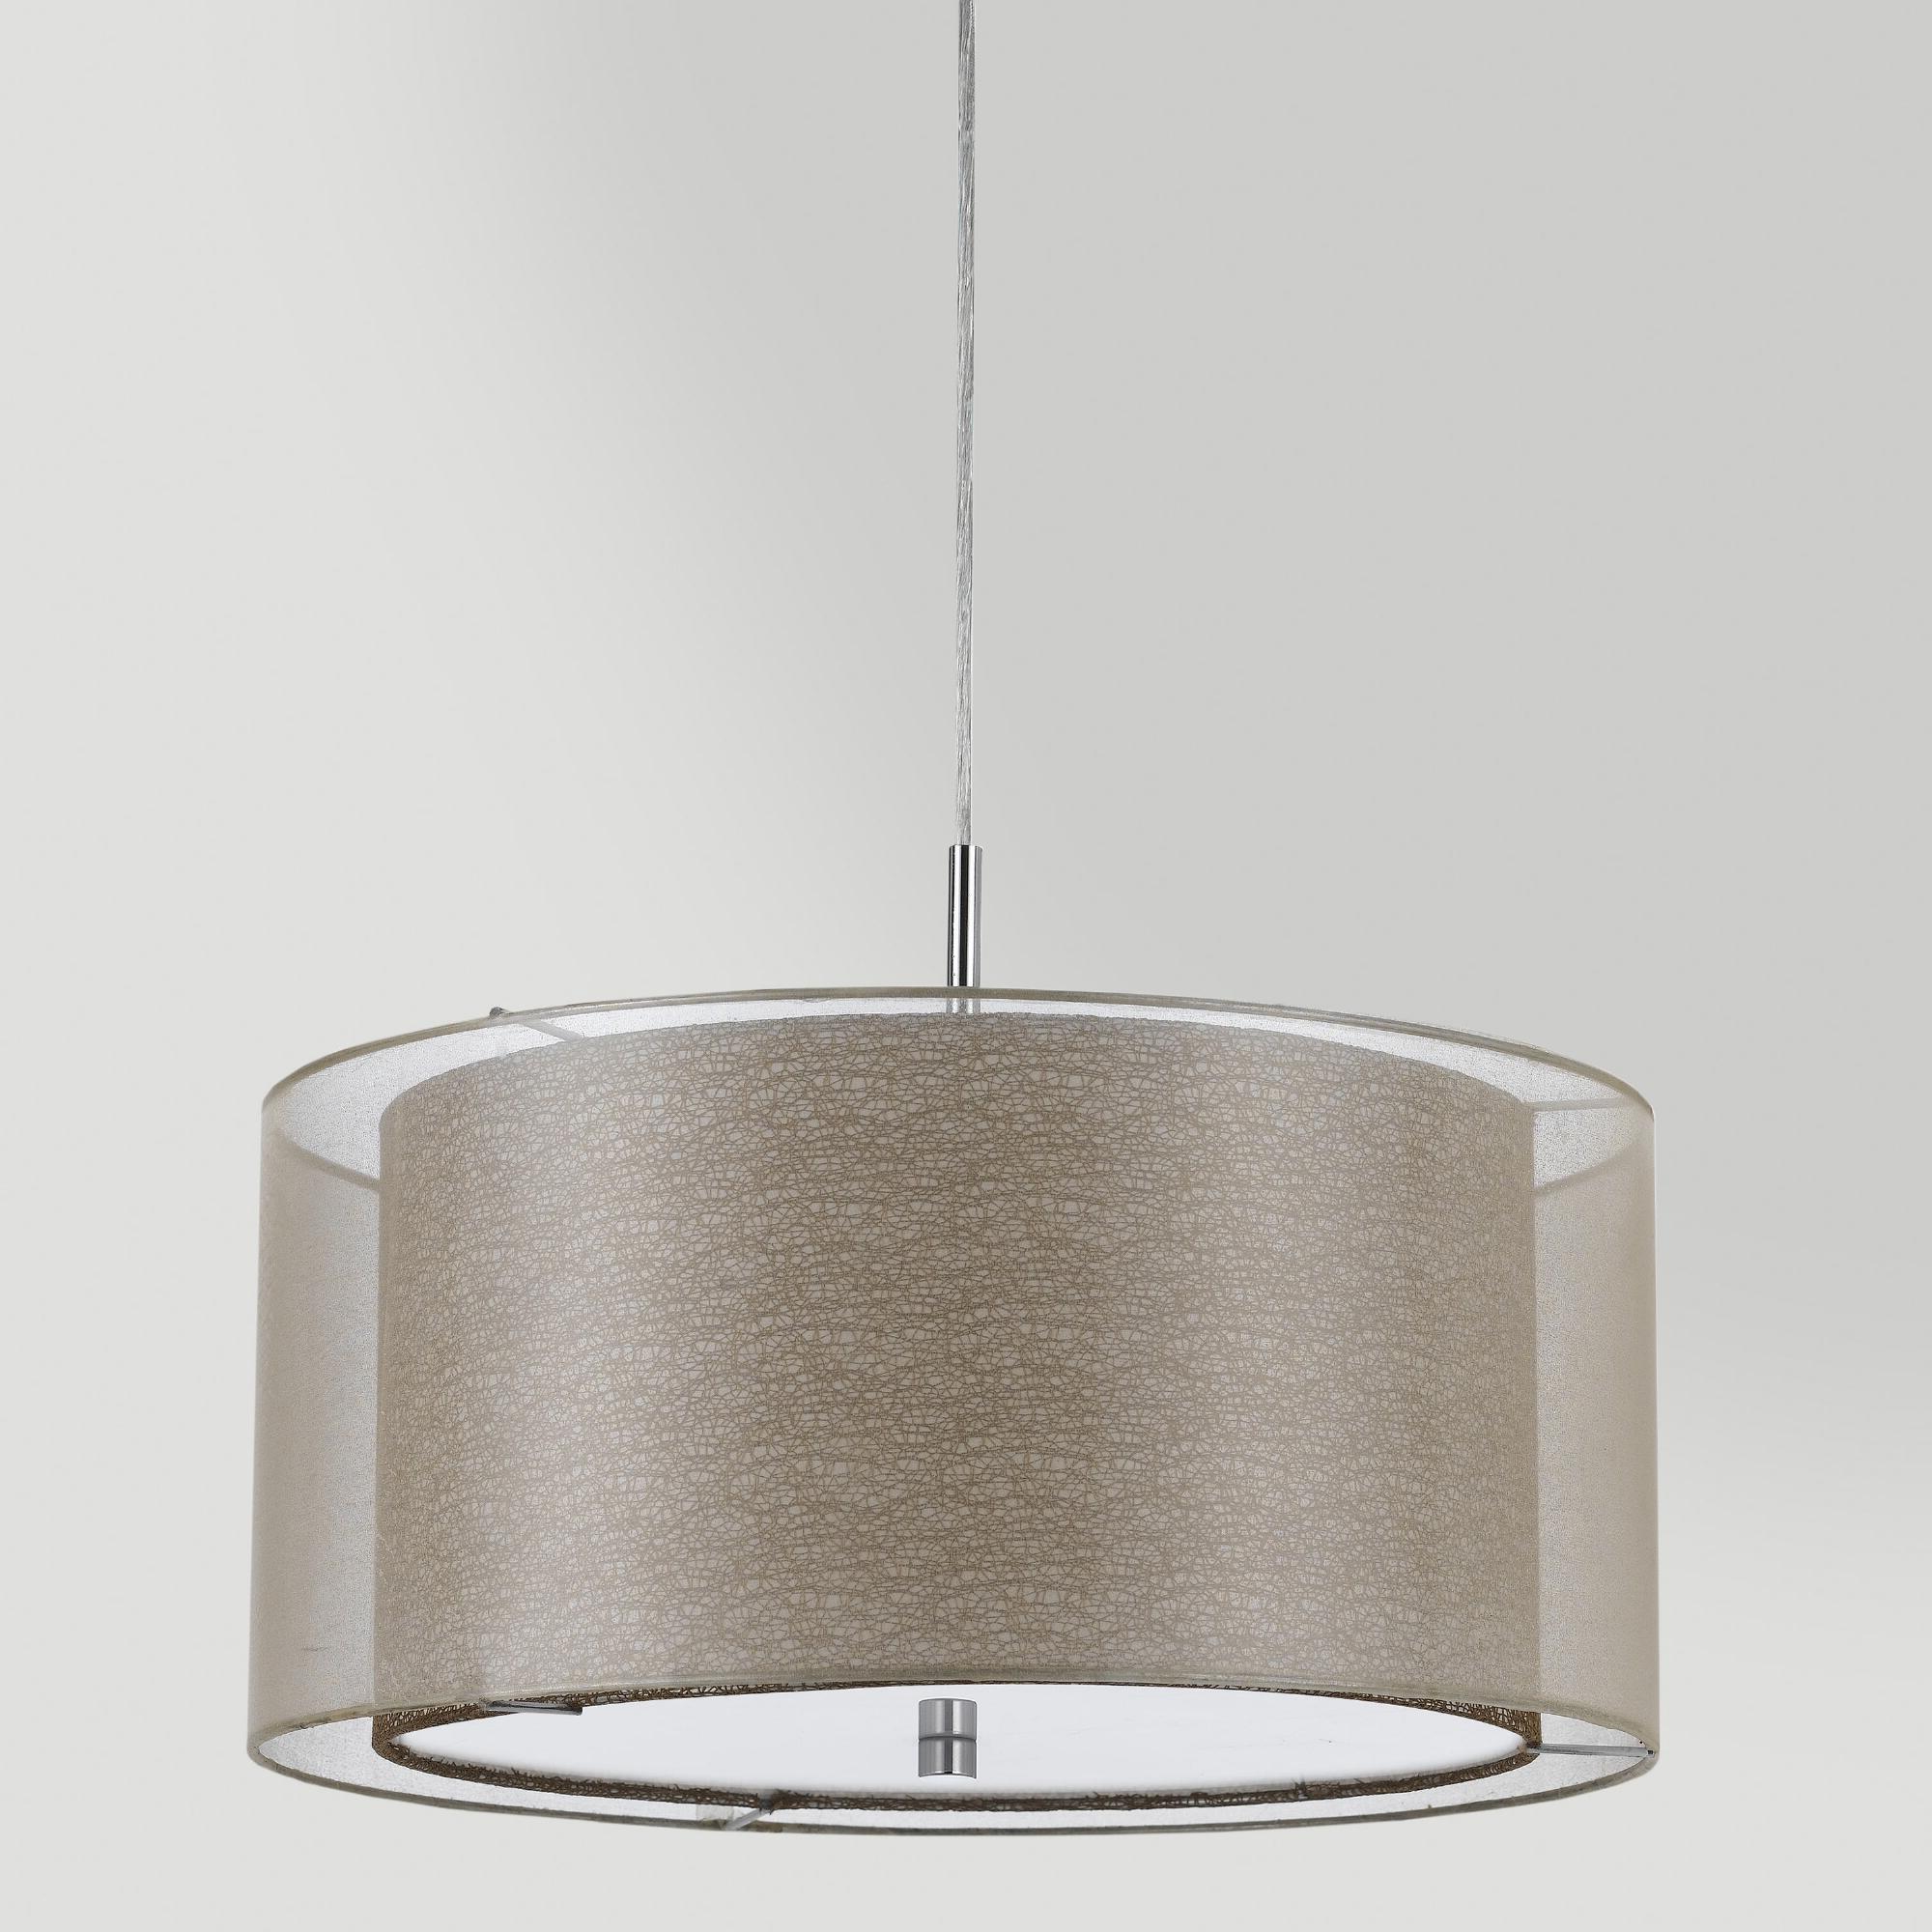 Well Known Outdoor Rattan Hanging Lights In Lighting : Dining Room Outdoor Lighting Table Barl Pendant Fixtures (View 19 of 20)